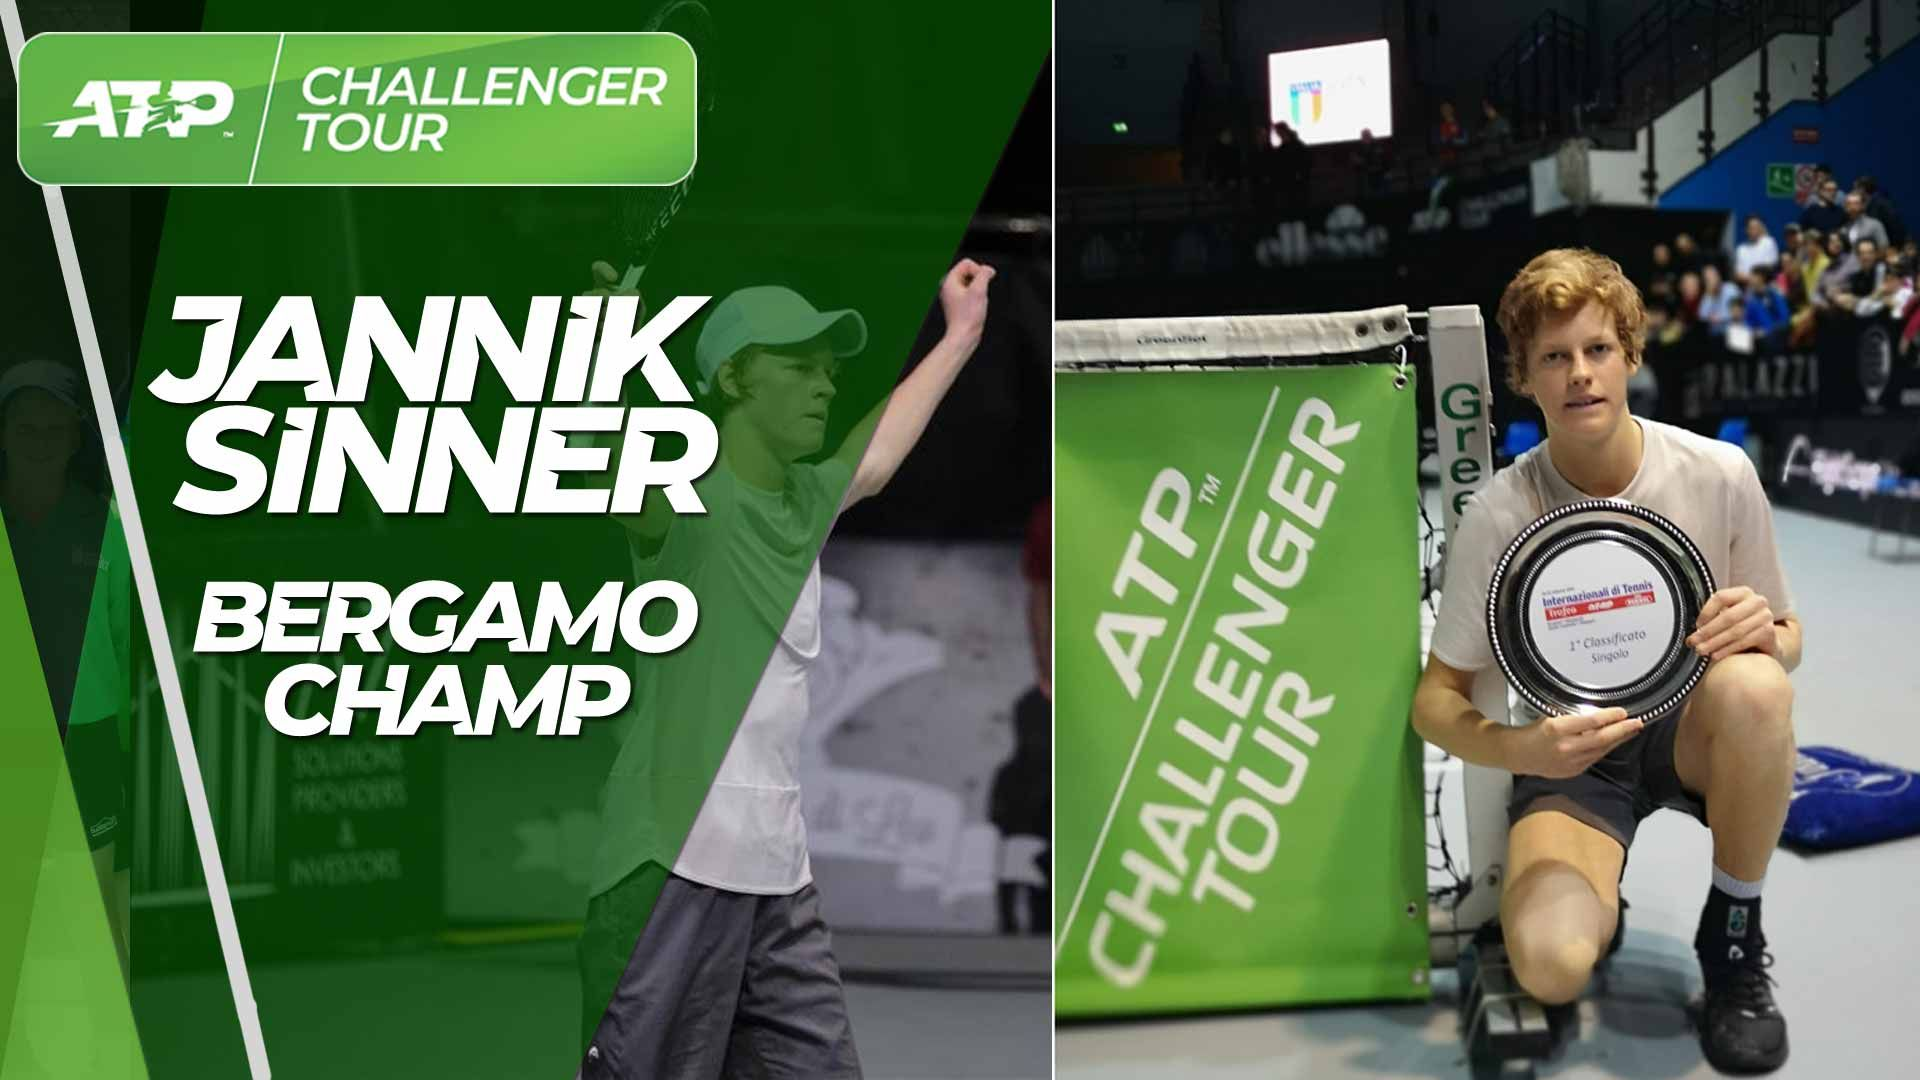 Atp Challenger 2019 Week 8 Jannik Sinner Il Gigante Della Rocca Del Baranci Conquista Bergamo Alessandro Zijno Blog